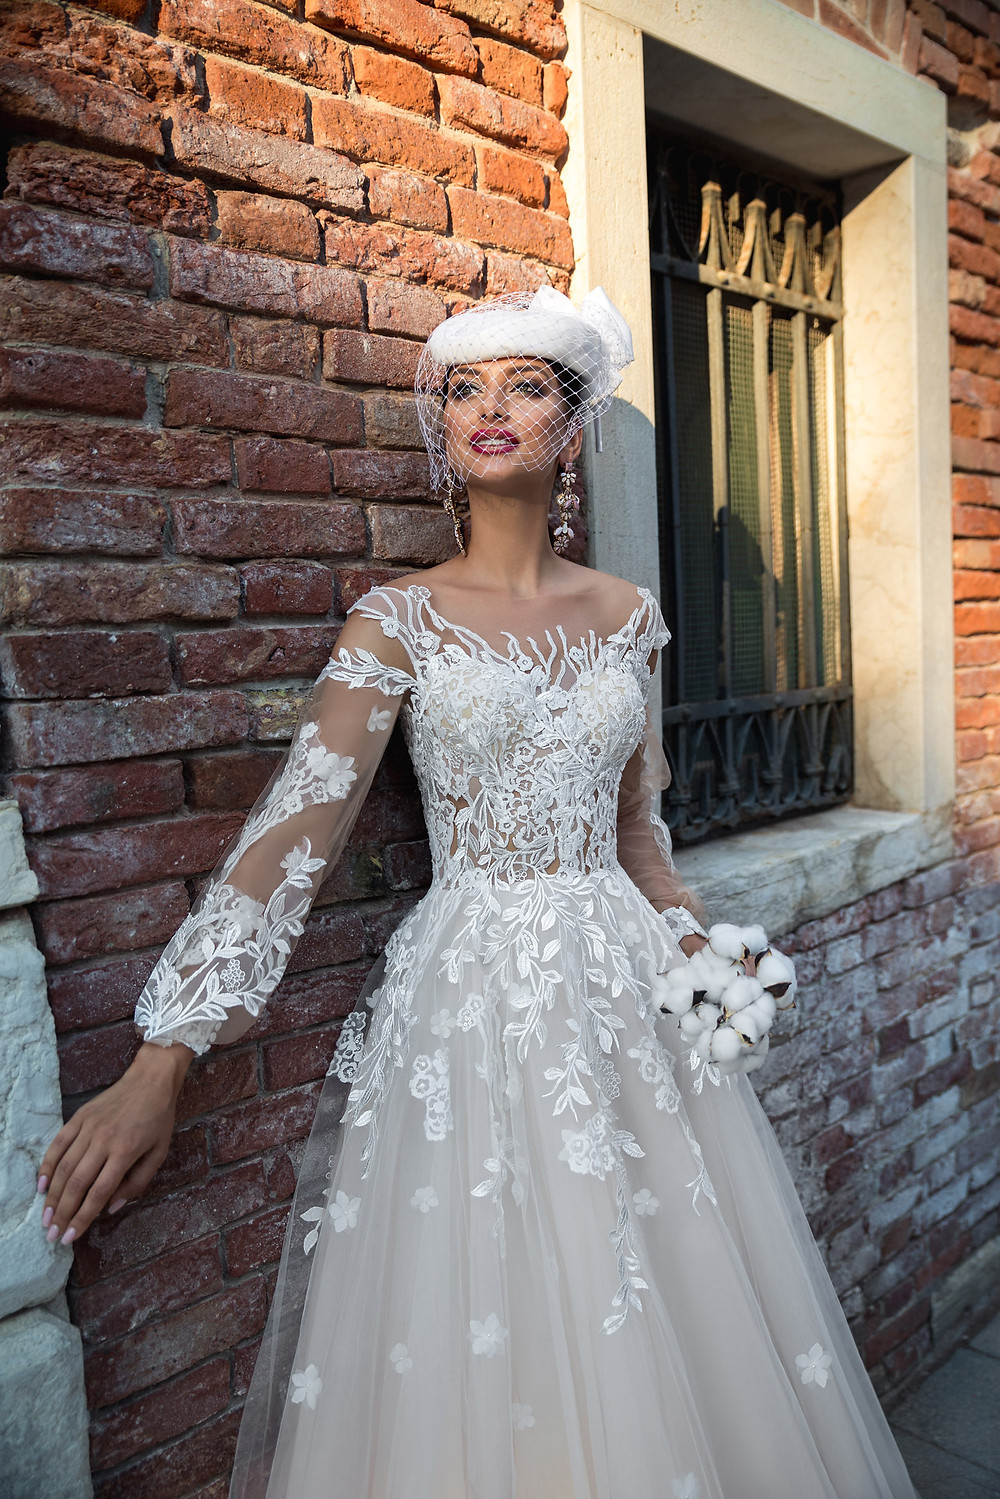 A-line wedding dress Modesta by Hadassa from collection MilanoLecce